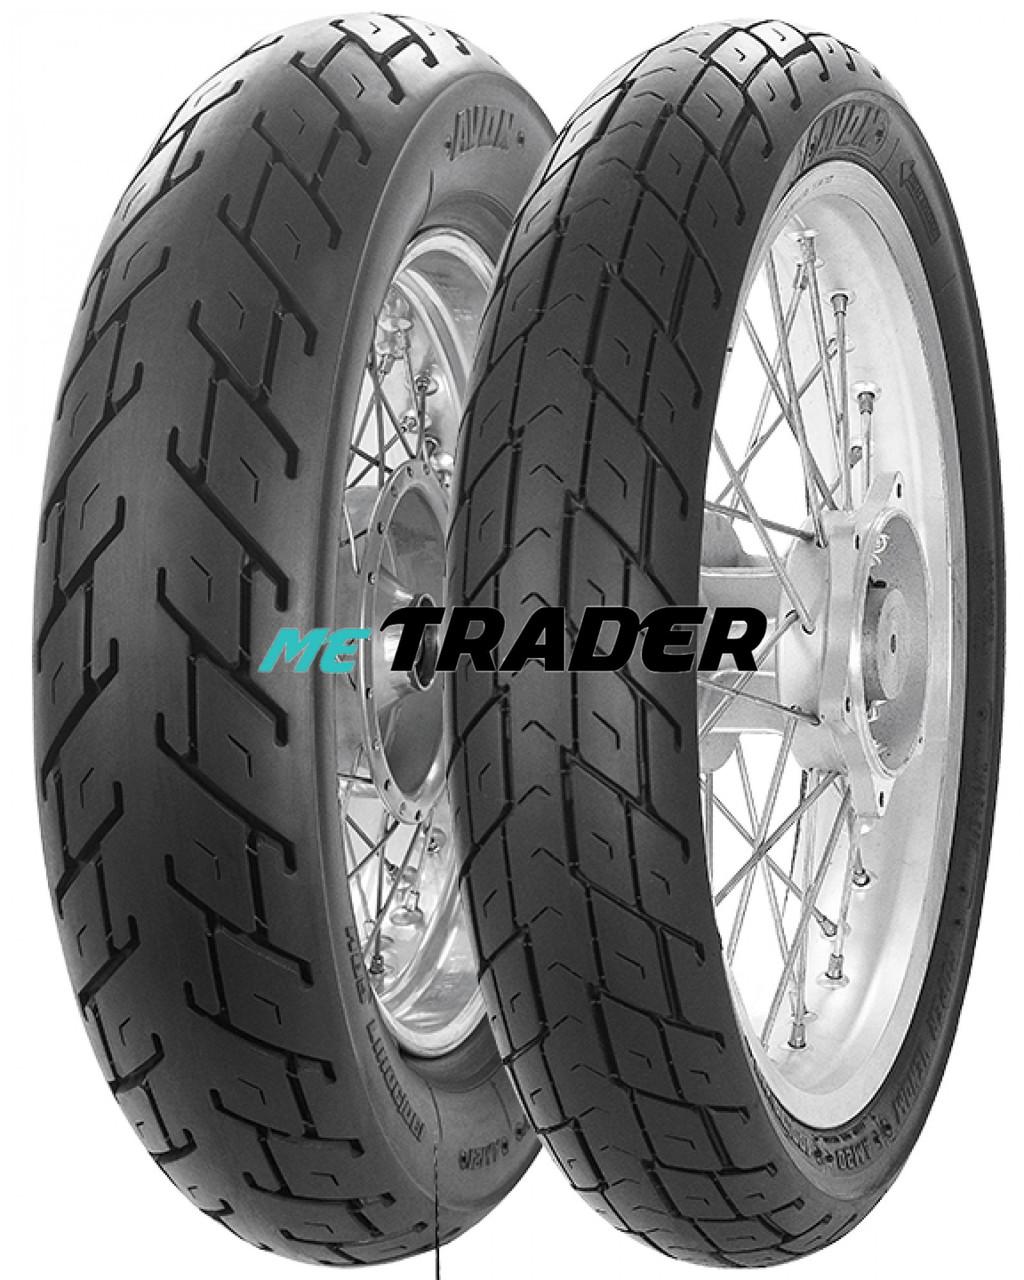 Avon Tyres AM20 RoadRunner 90/90 R21 54H TL FRONT